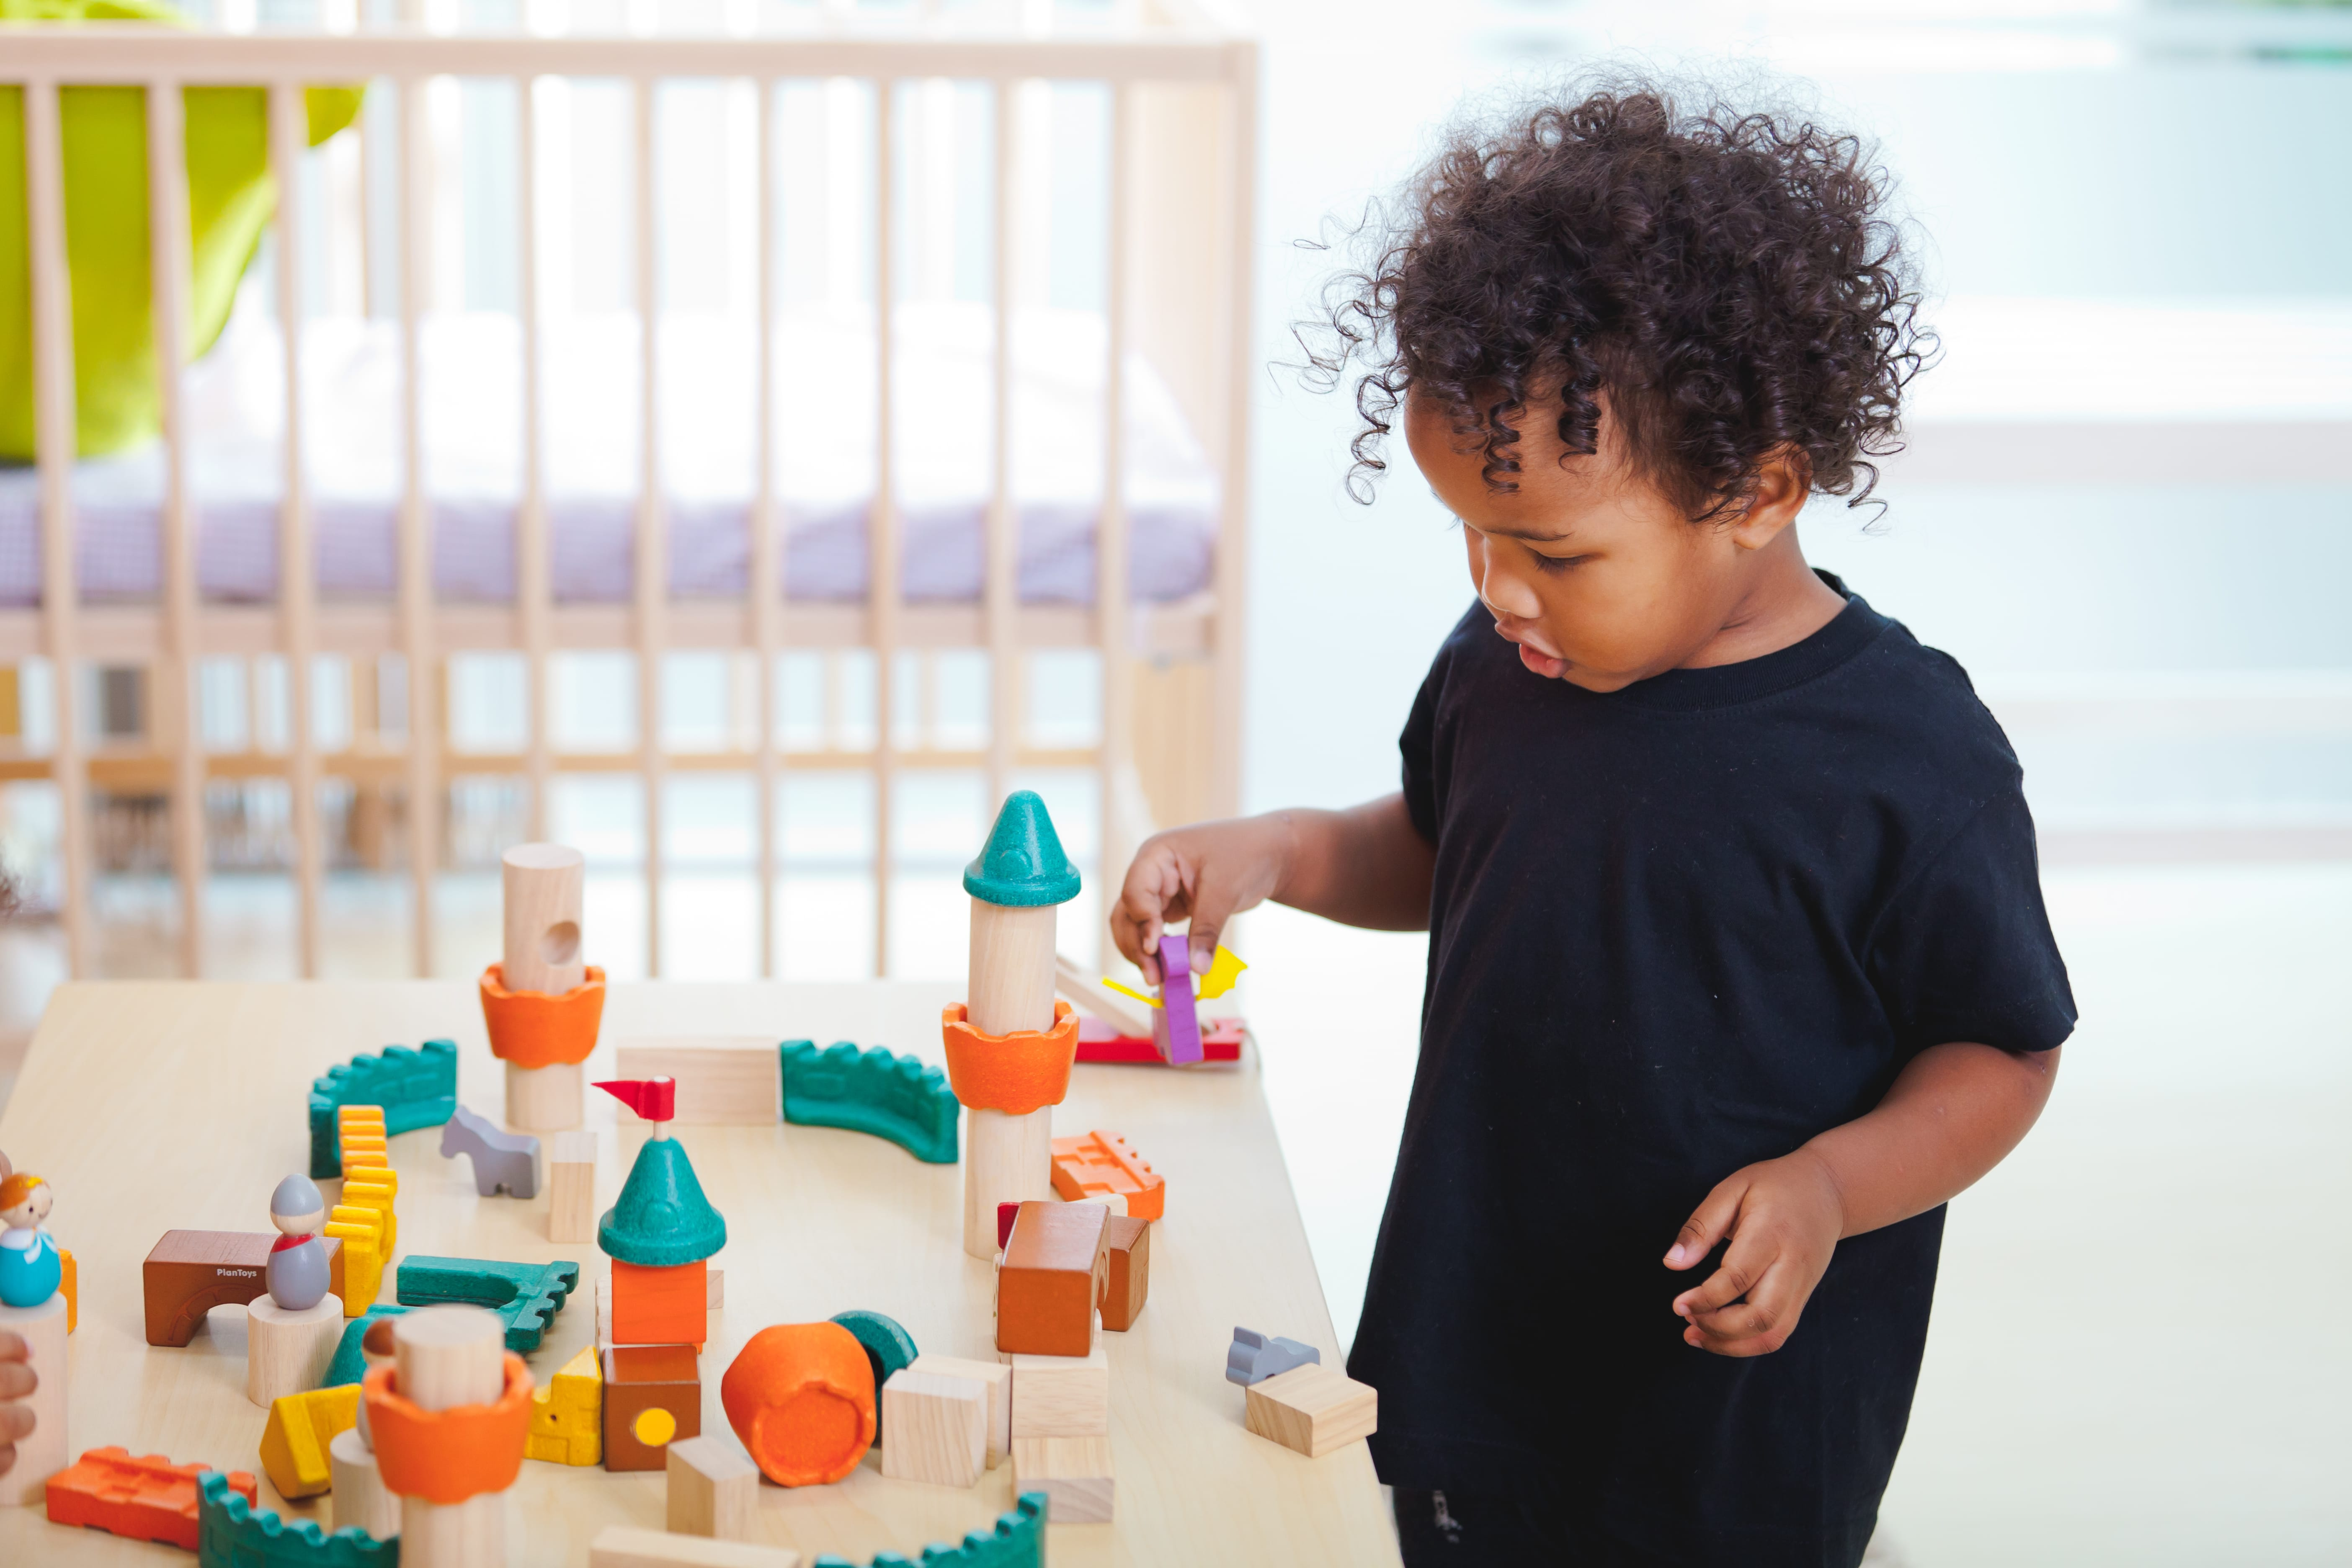 5696_PlanToys_FANTASY_BLOCKS_Blocks_and_Construction_Fine_Motor_Coordination_Creative_Tactile_3yrs_Wooden_toys_Education_toys_Safety_Toys_Non-toxic_4.jpg